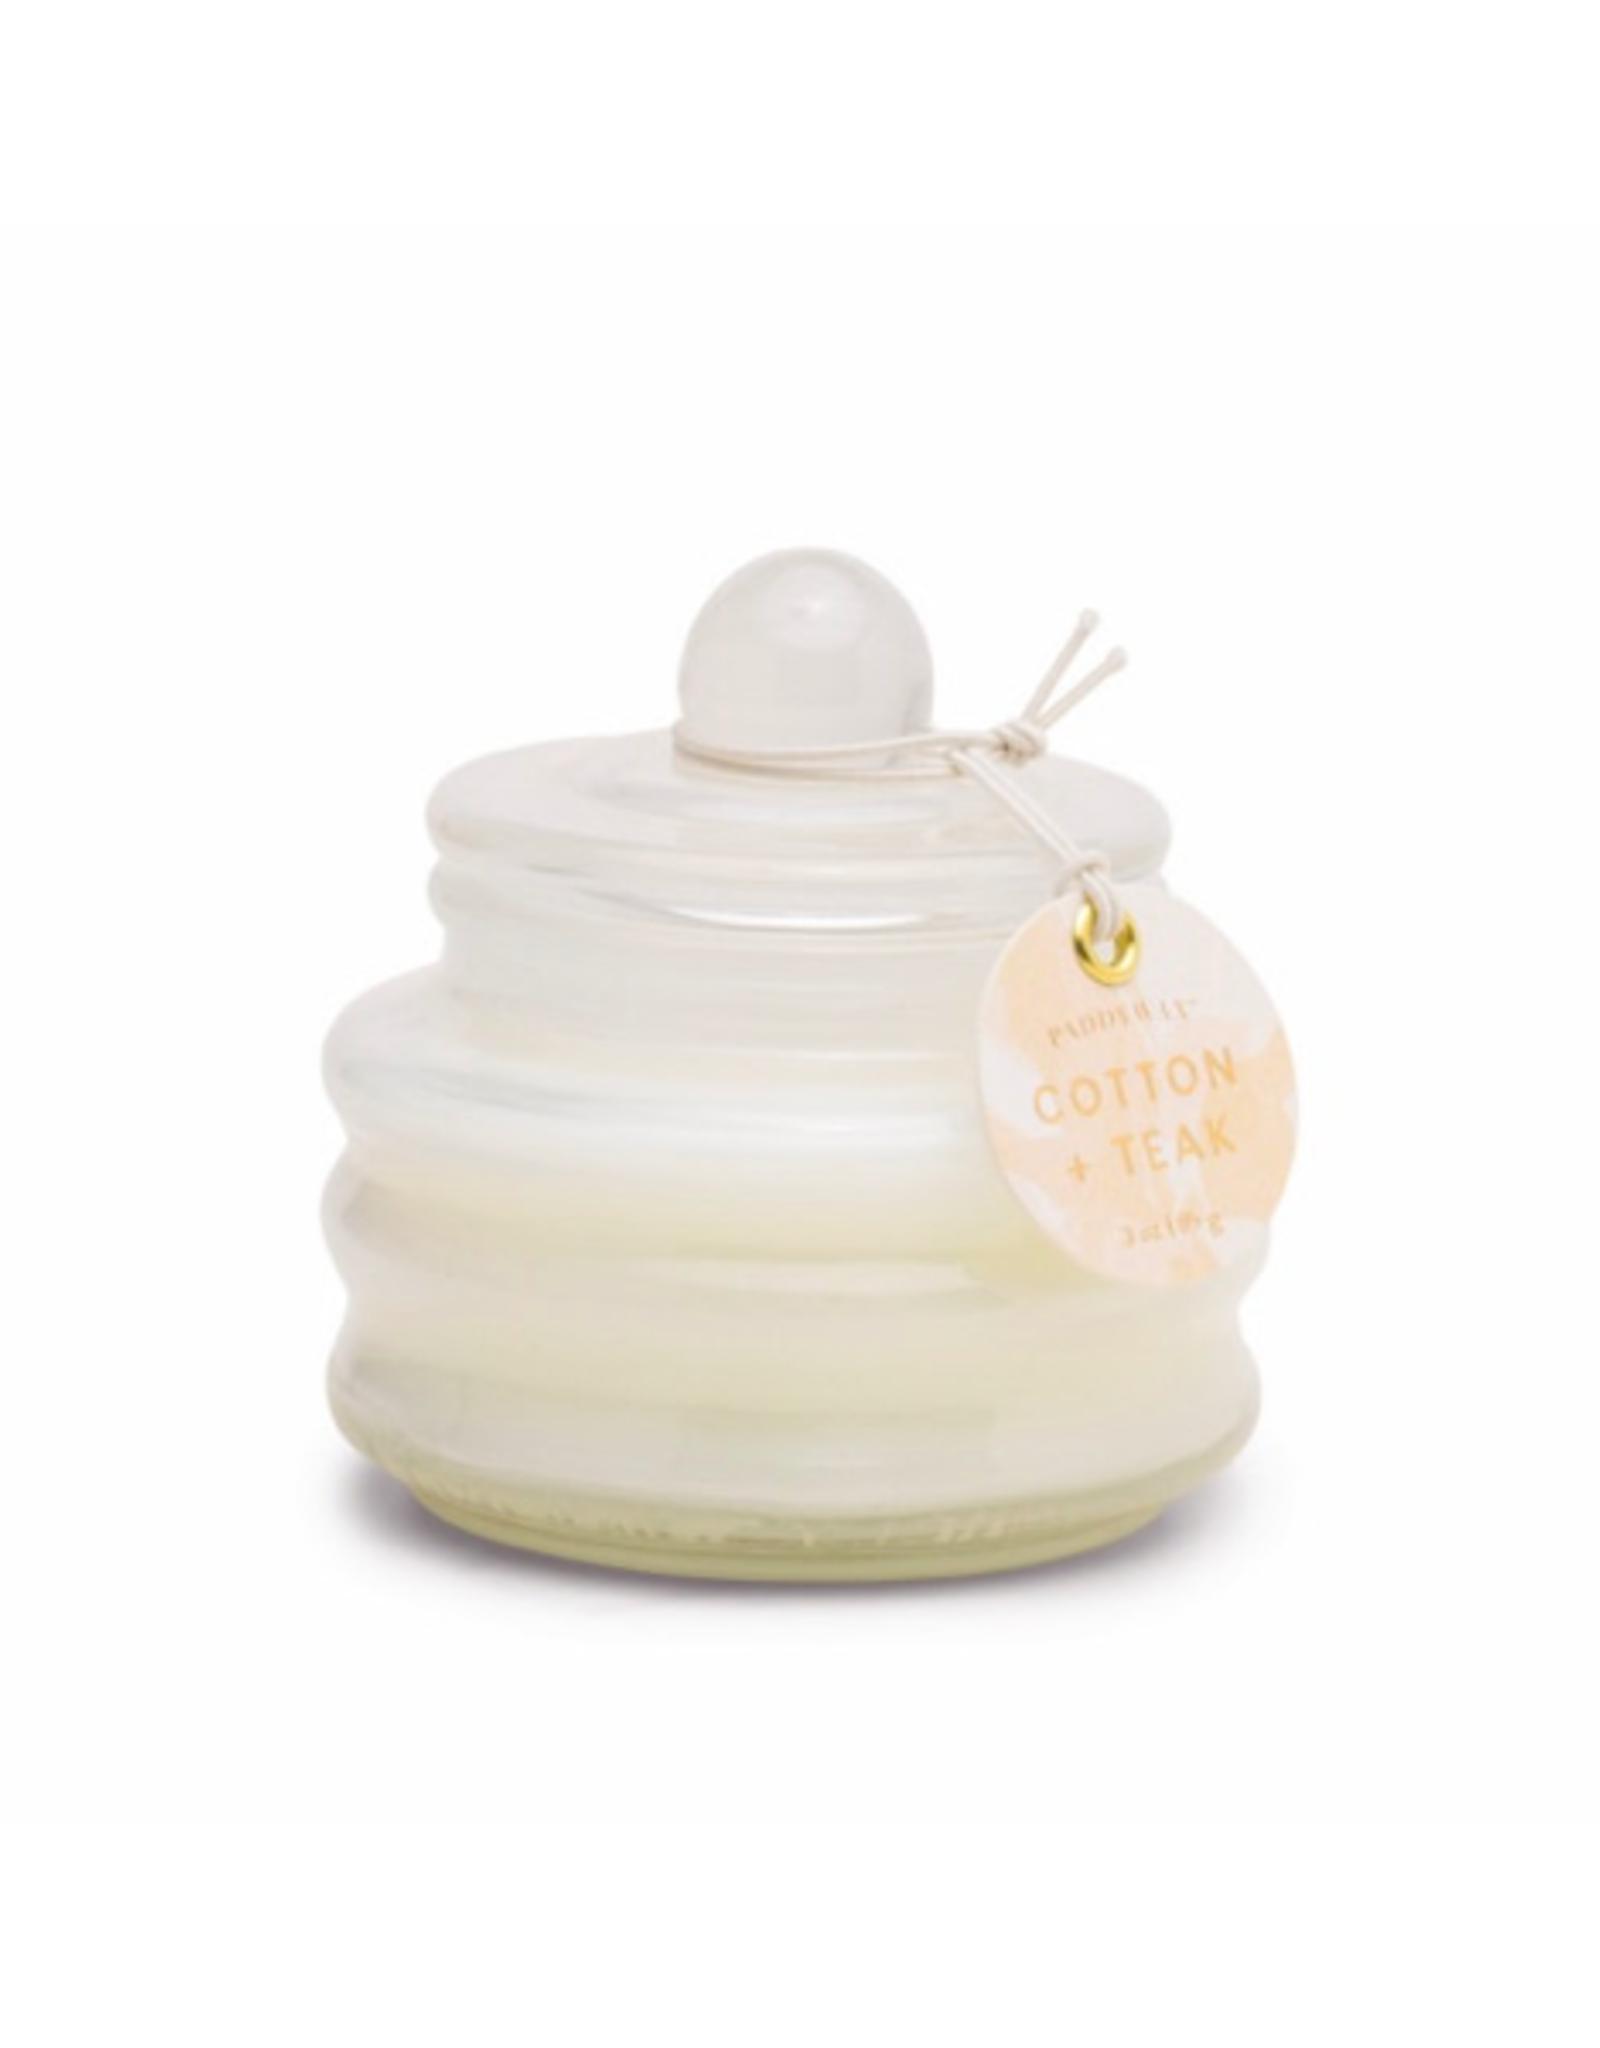 PAX - Soy Candle / Cotton & Teak, White Bubble Glass, 3oz